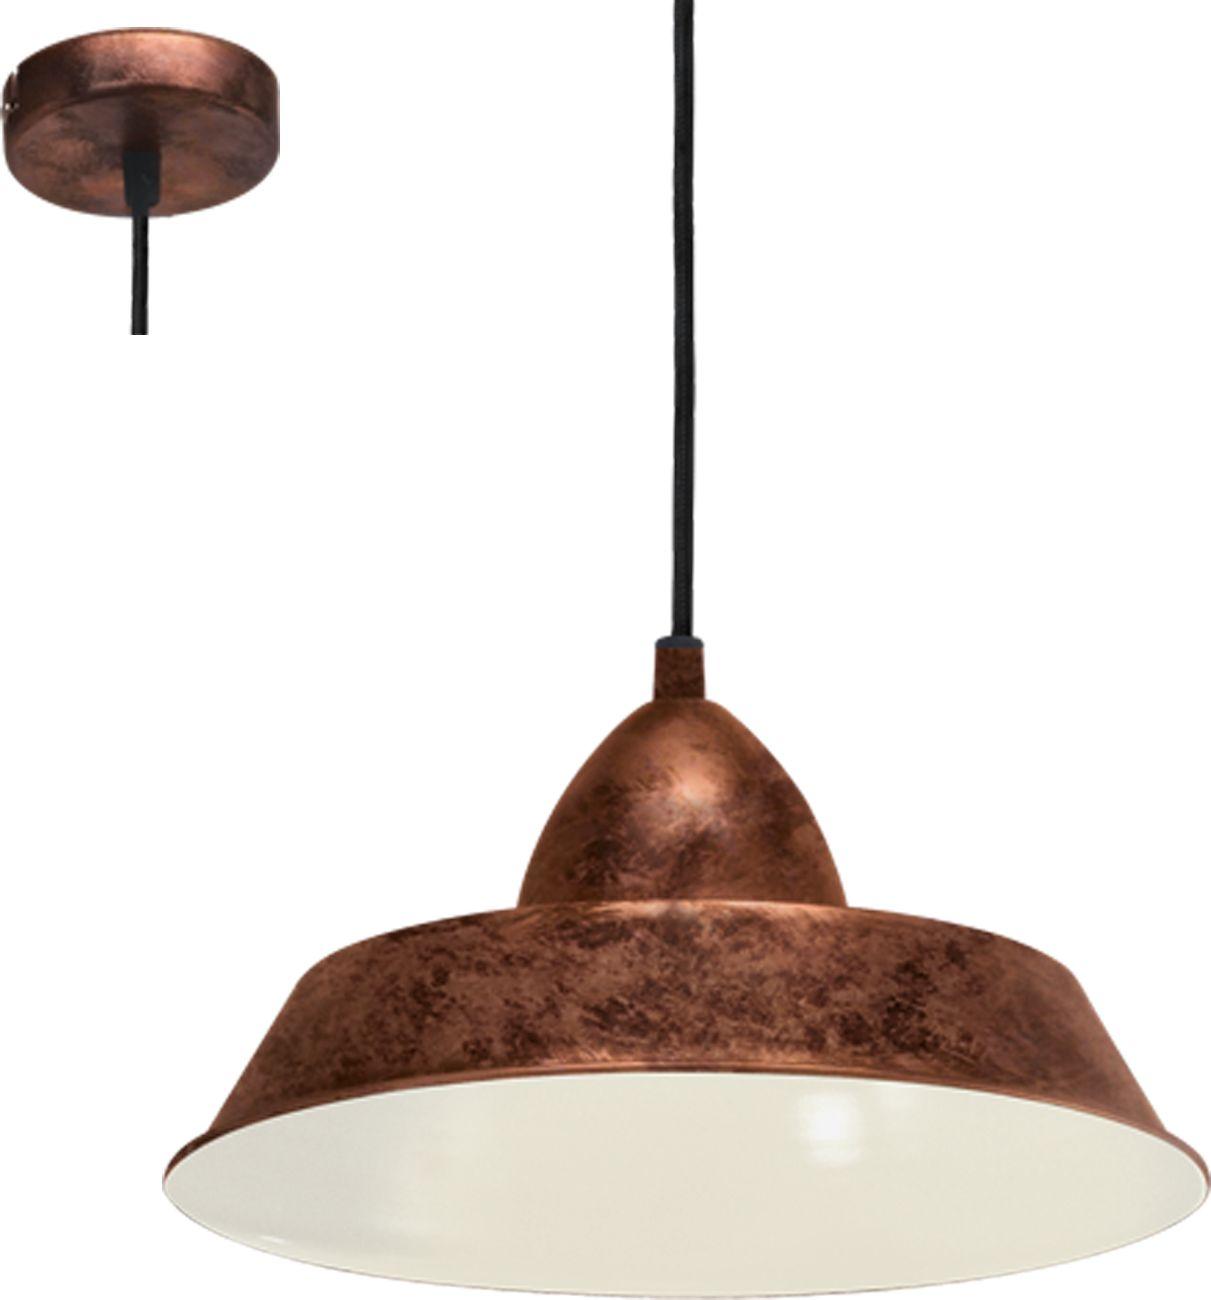 Eglo lampa wisząca Auckland 49243 - SUPER OFERTA - RABAT w koszyku